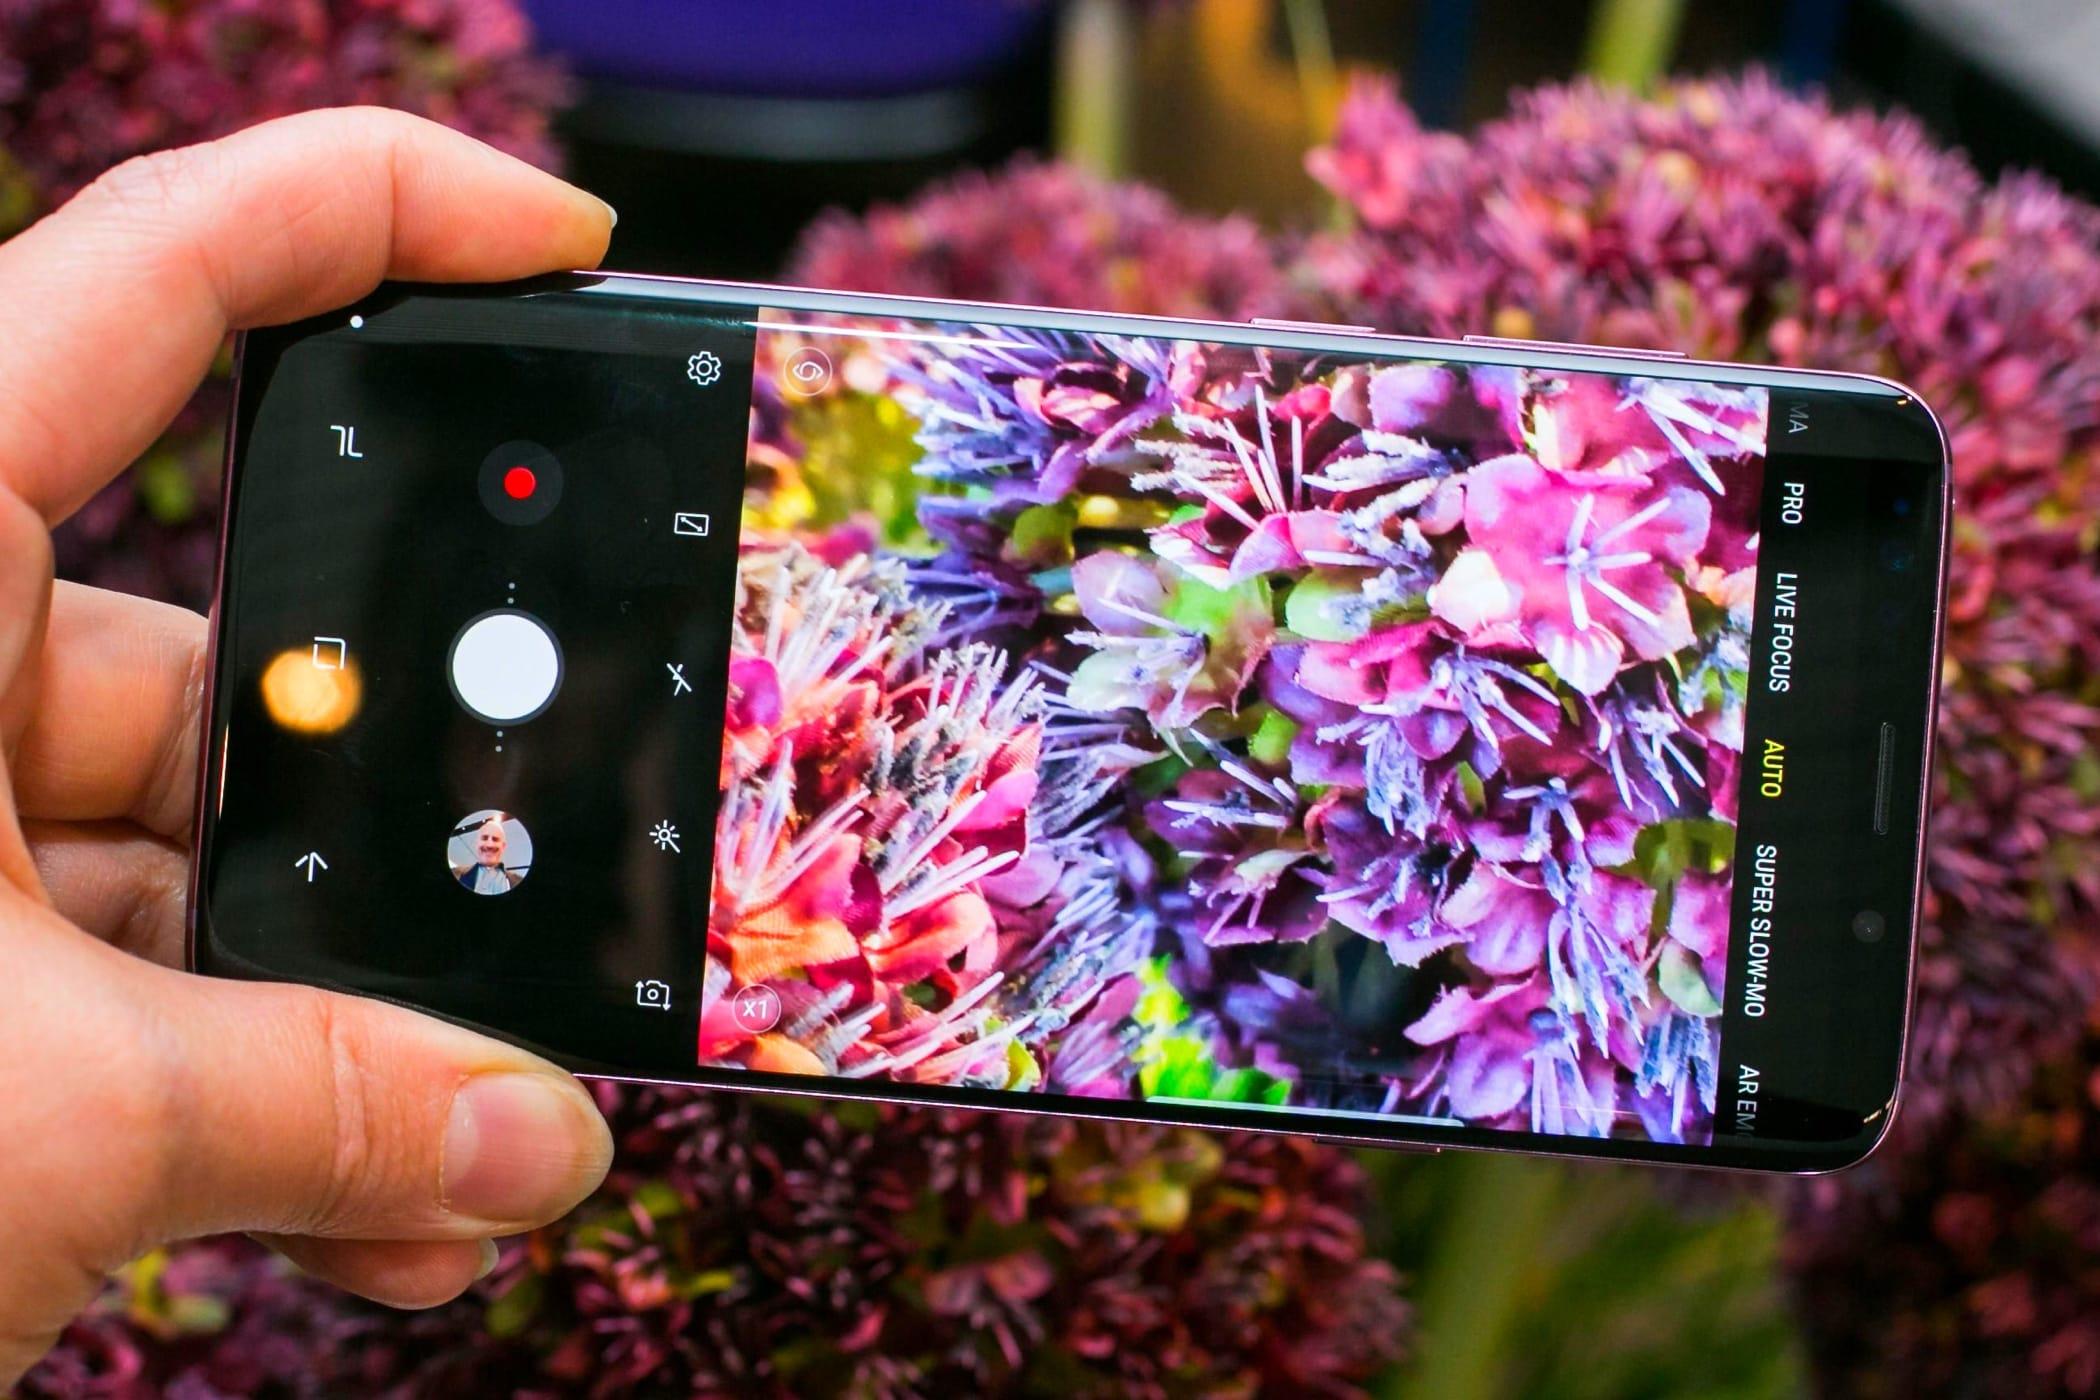 Самсунг уже тестирует Galaxy Note 9 c«бесконечным» дисплеем и андроид Oreo